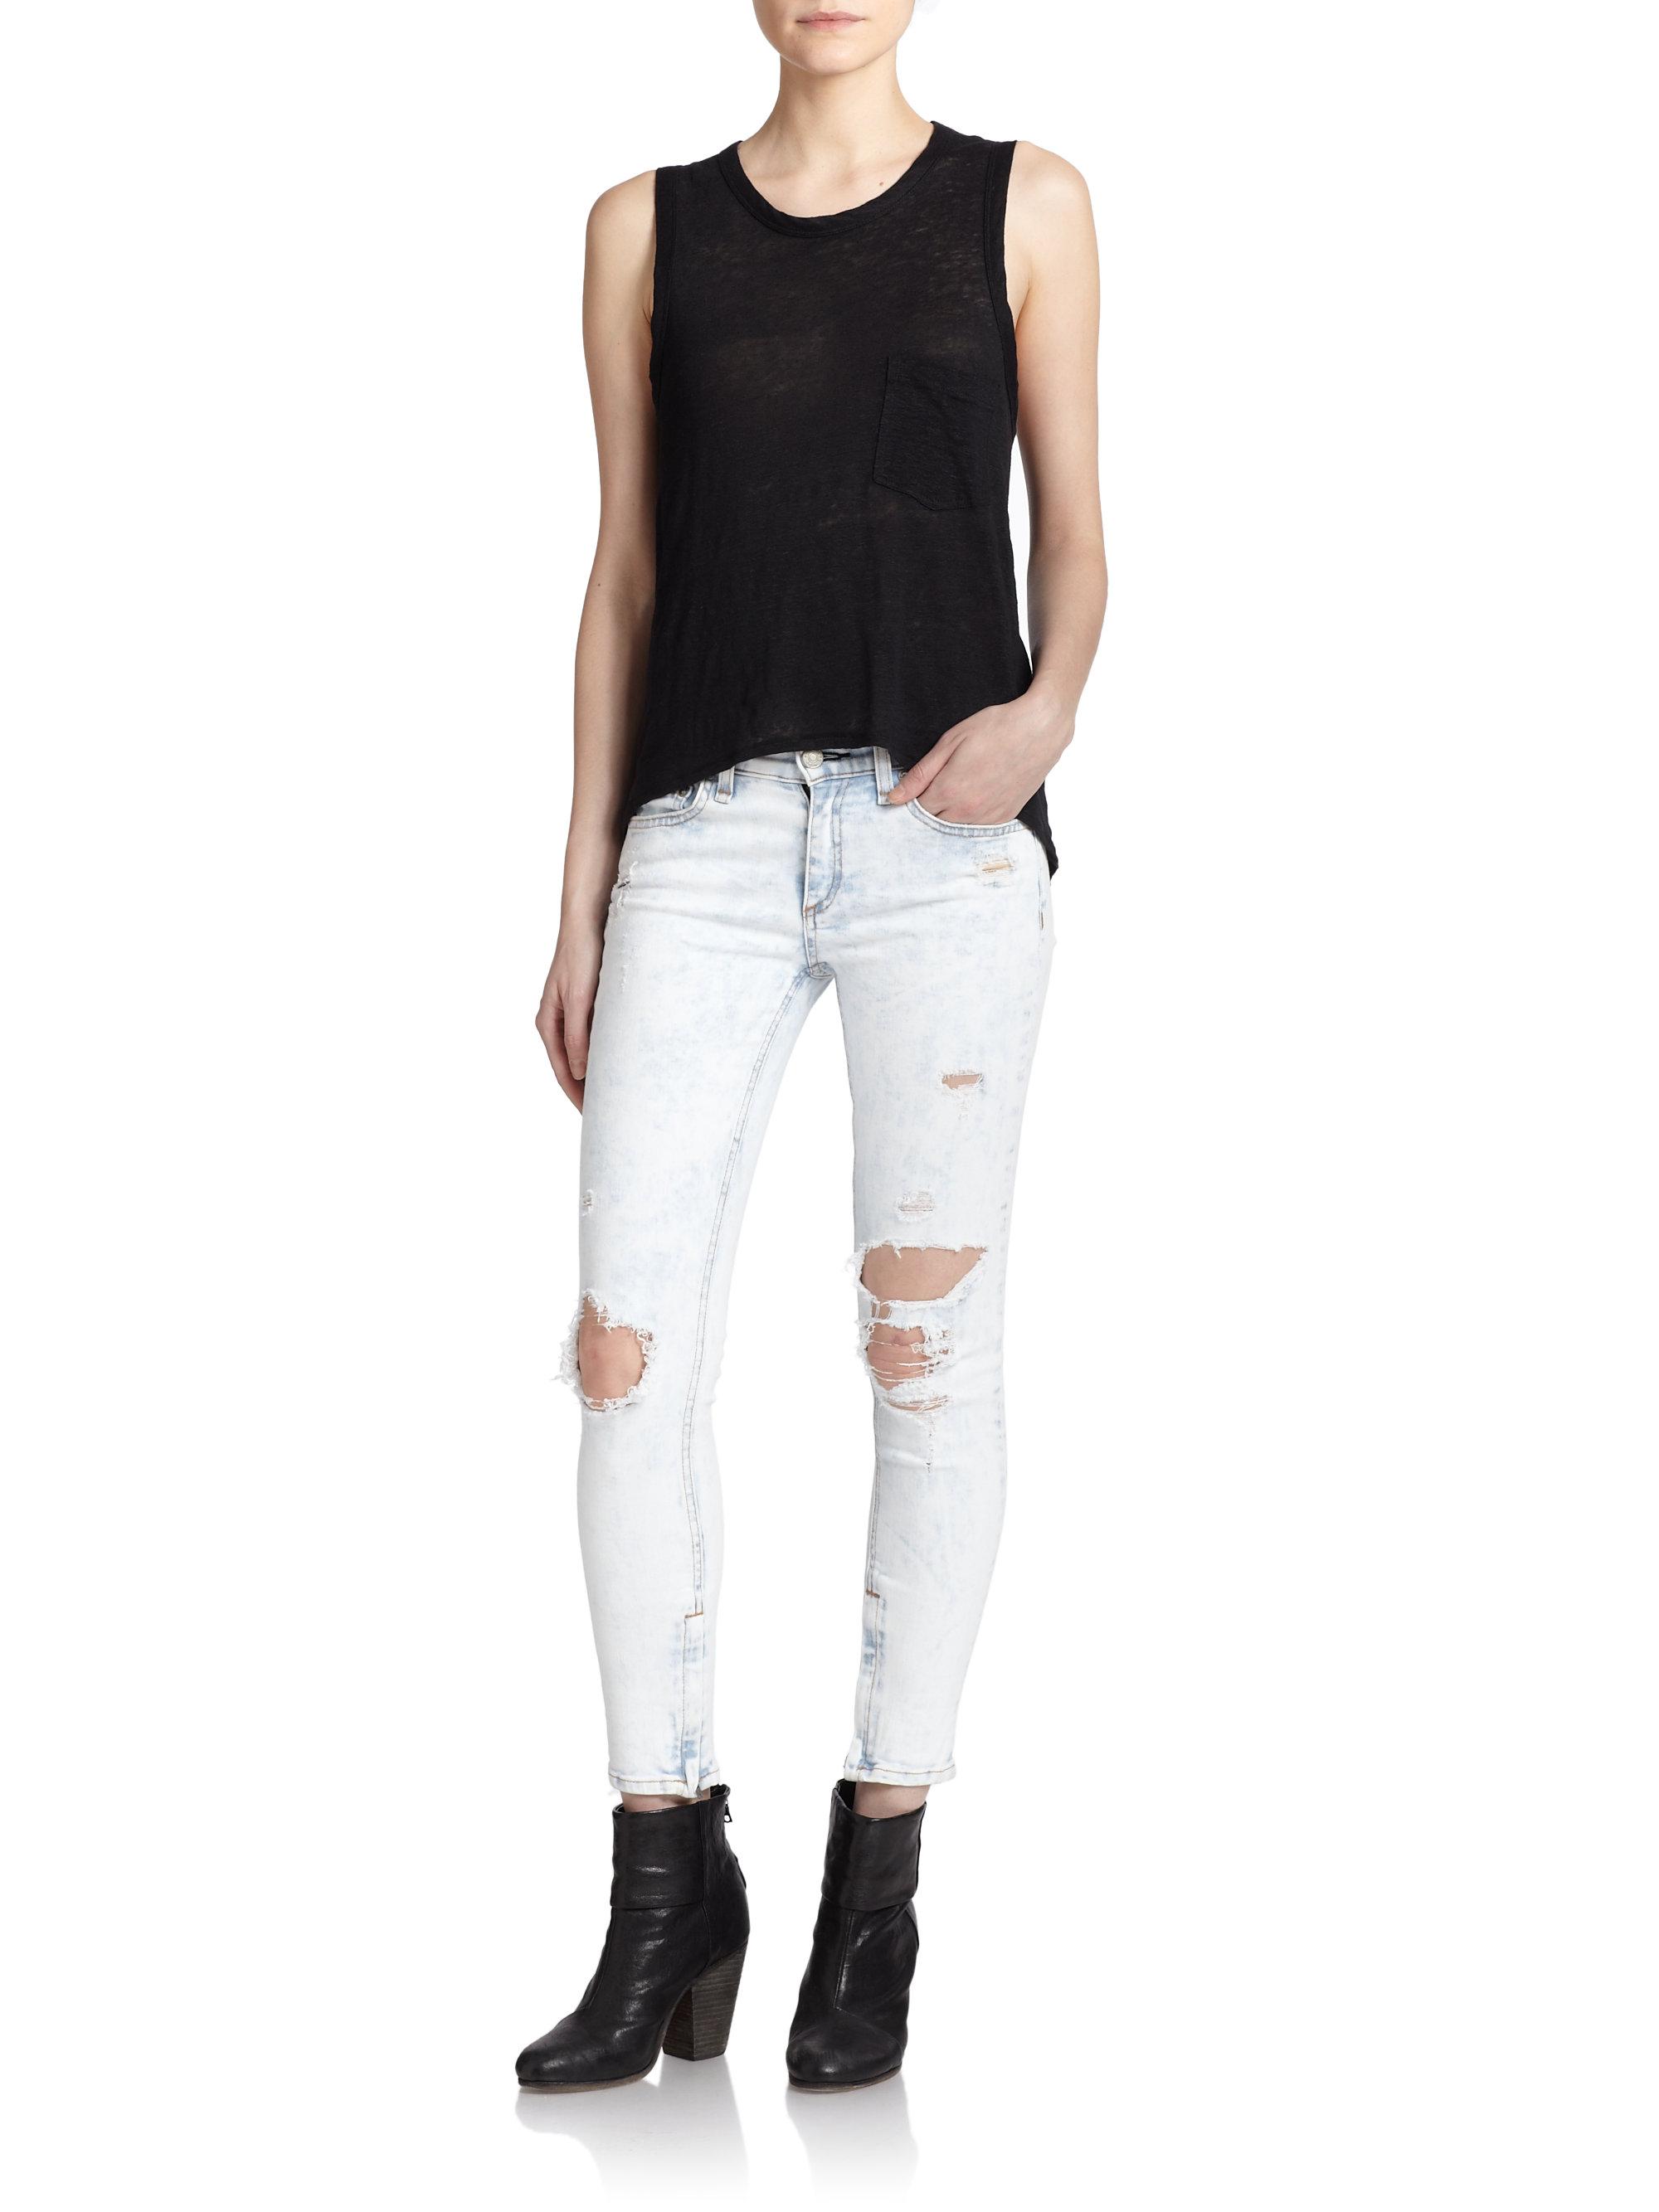 Rag & bone Distressed Bleached Ankle Skinny Jeans in Blue | Lyst